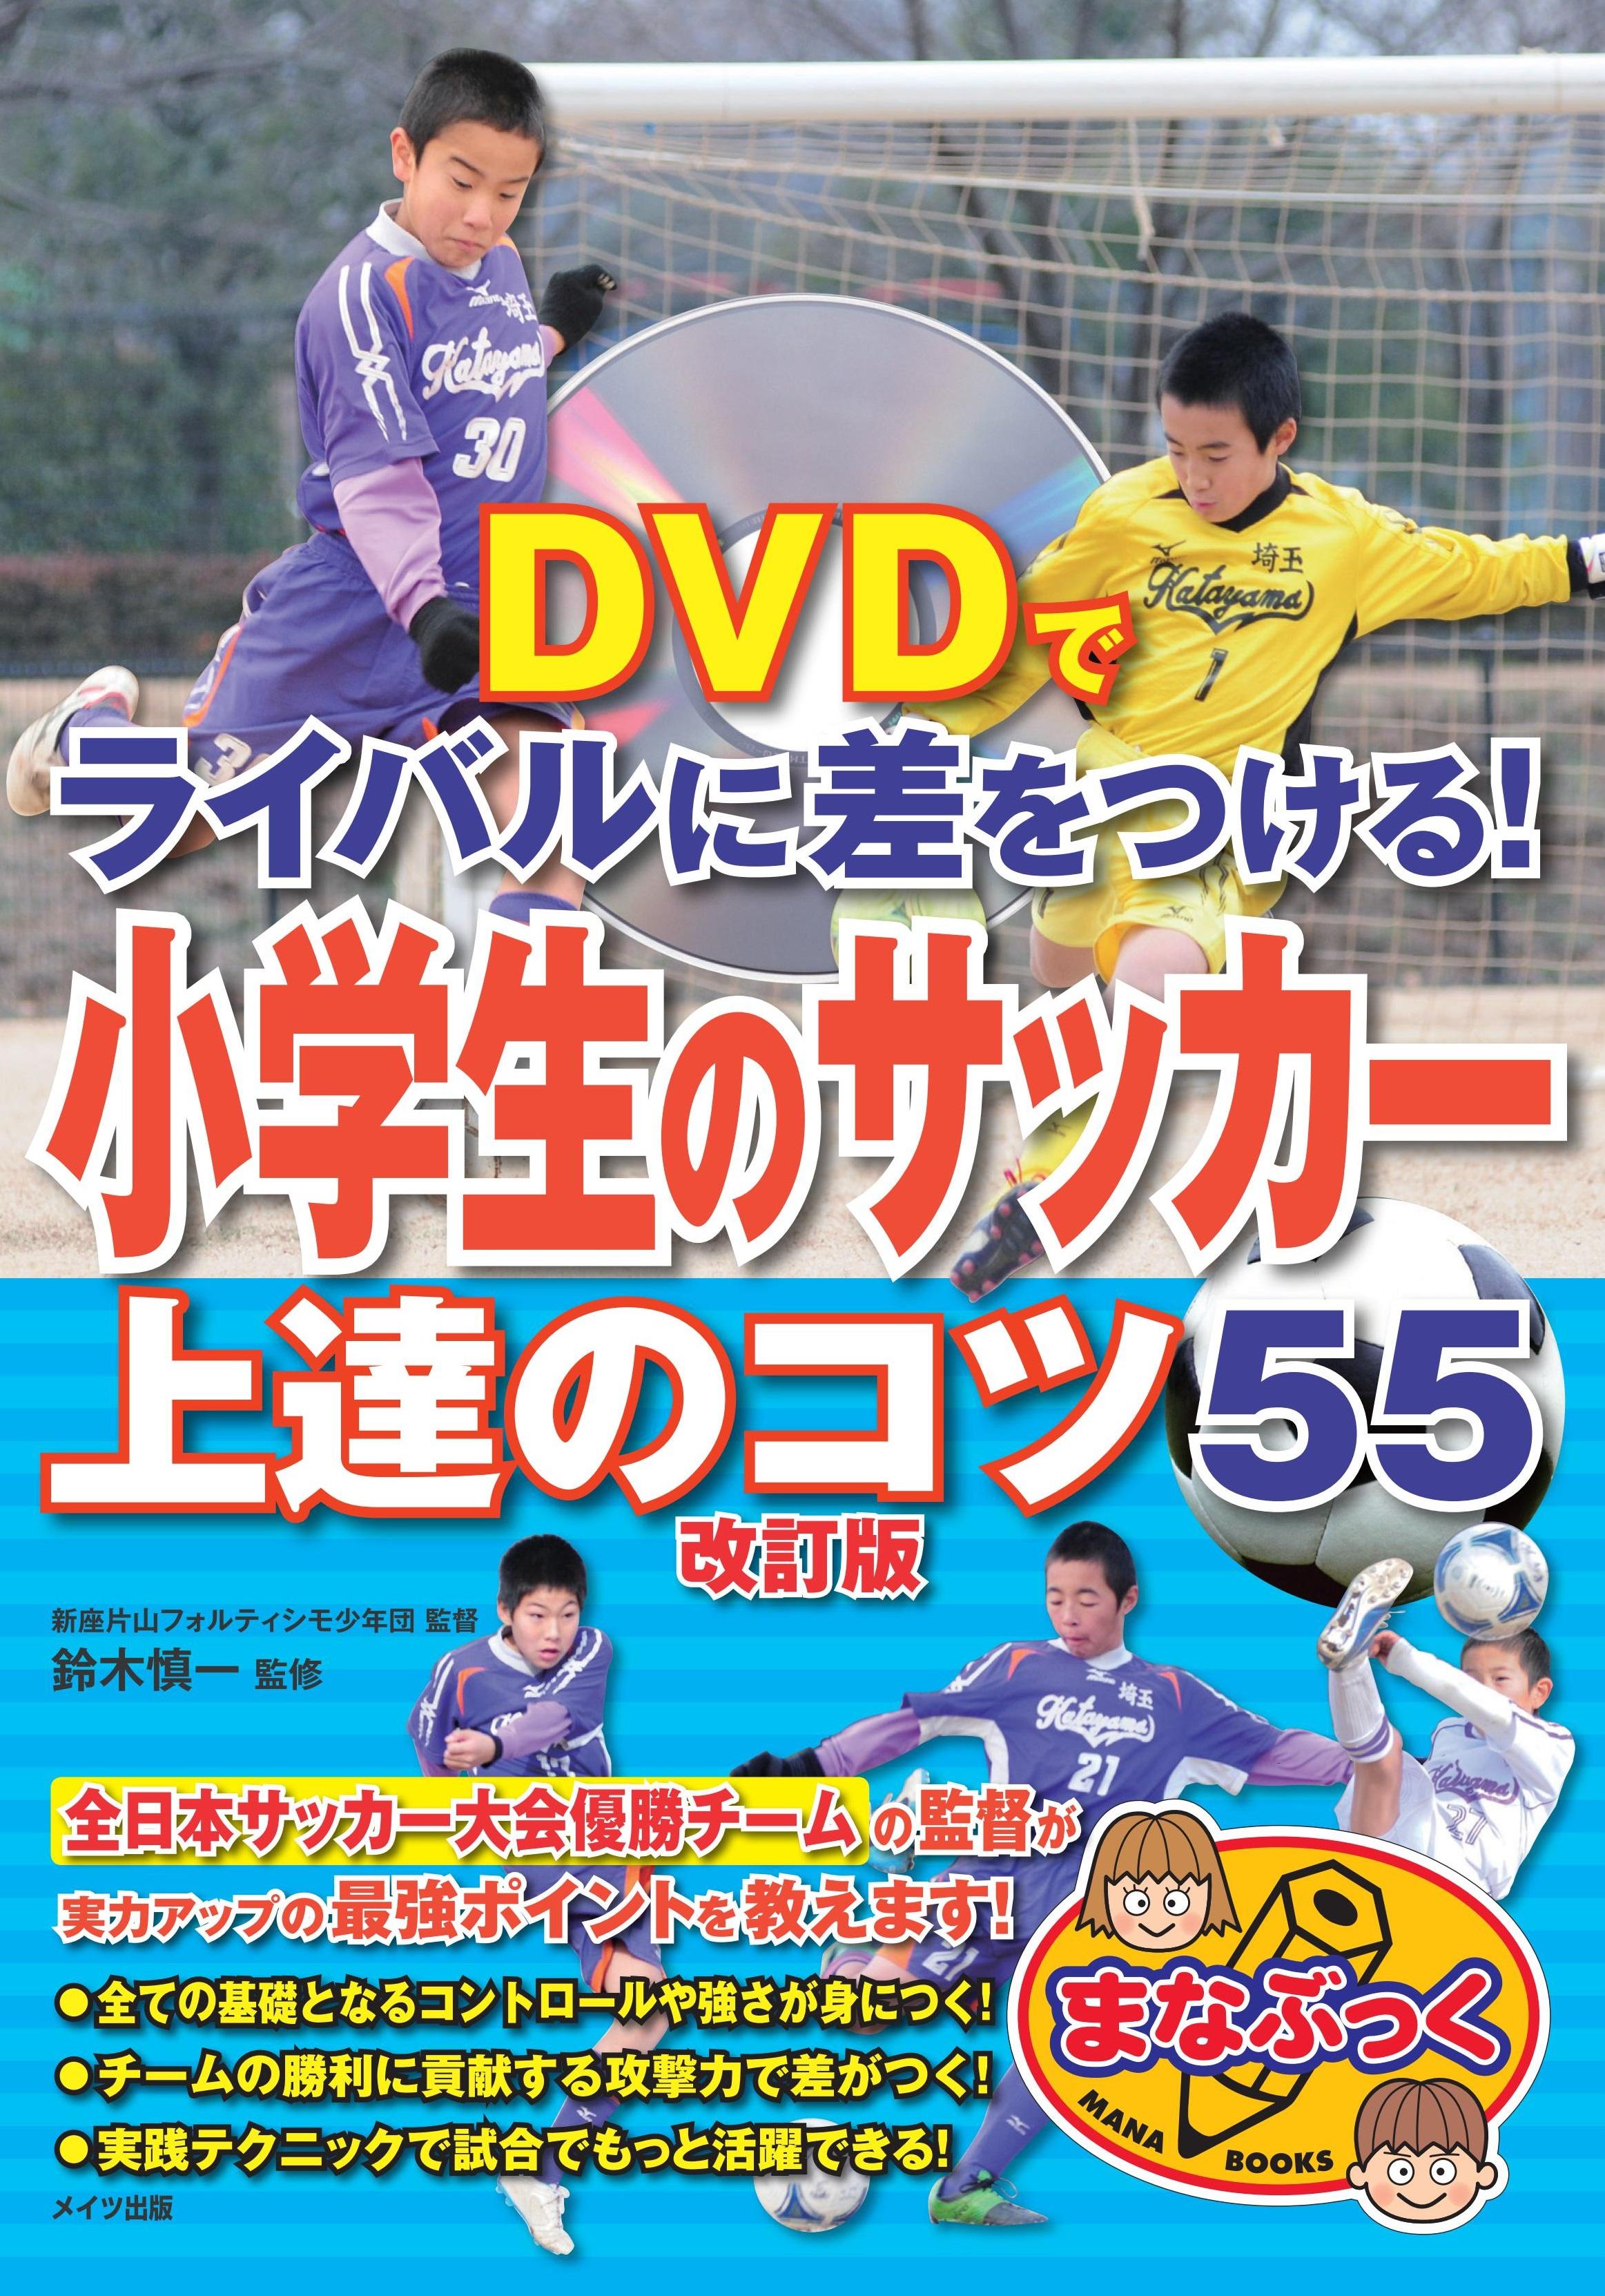 DVDでライバルに差をつける! 小学生のサッカー 上達のコツ55 改訂版